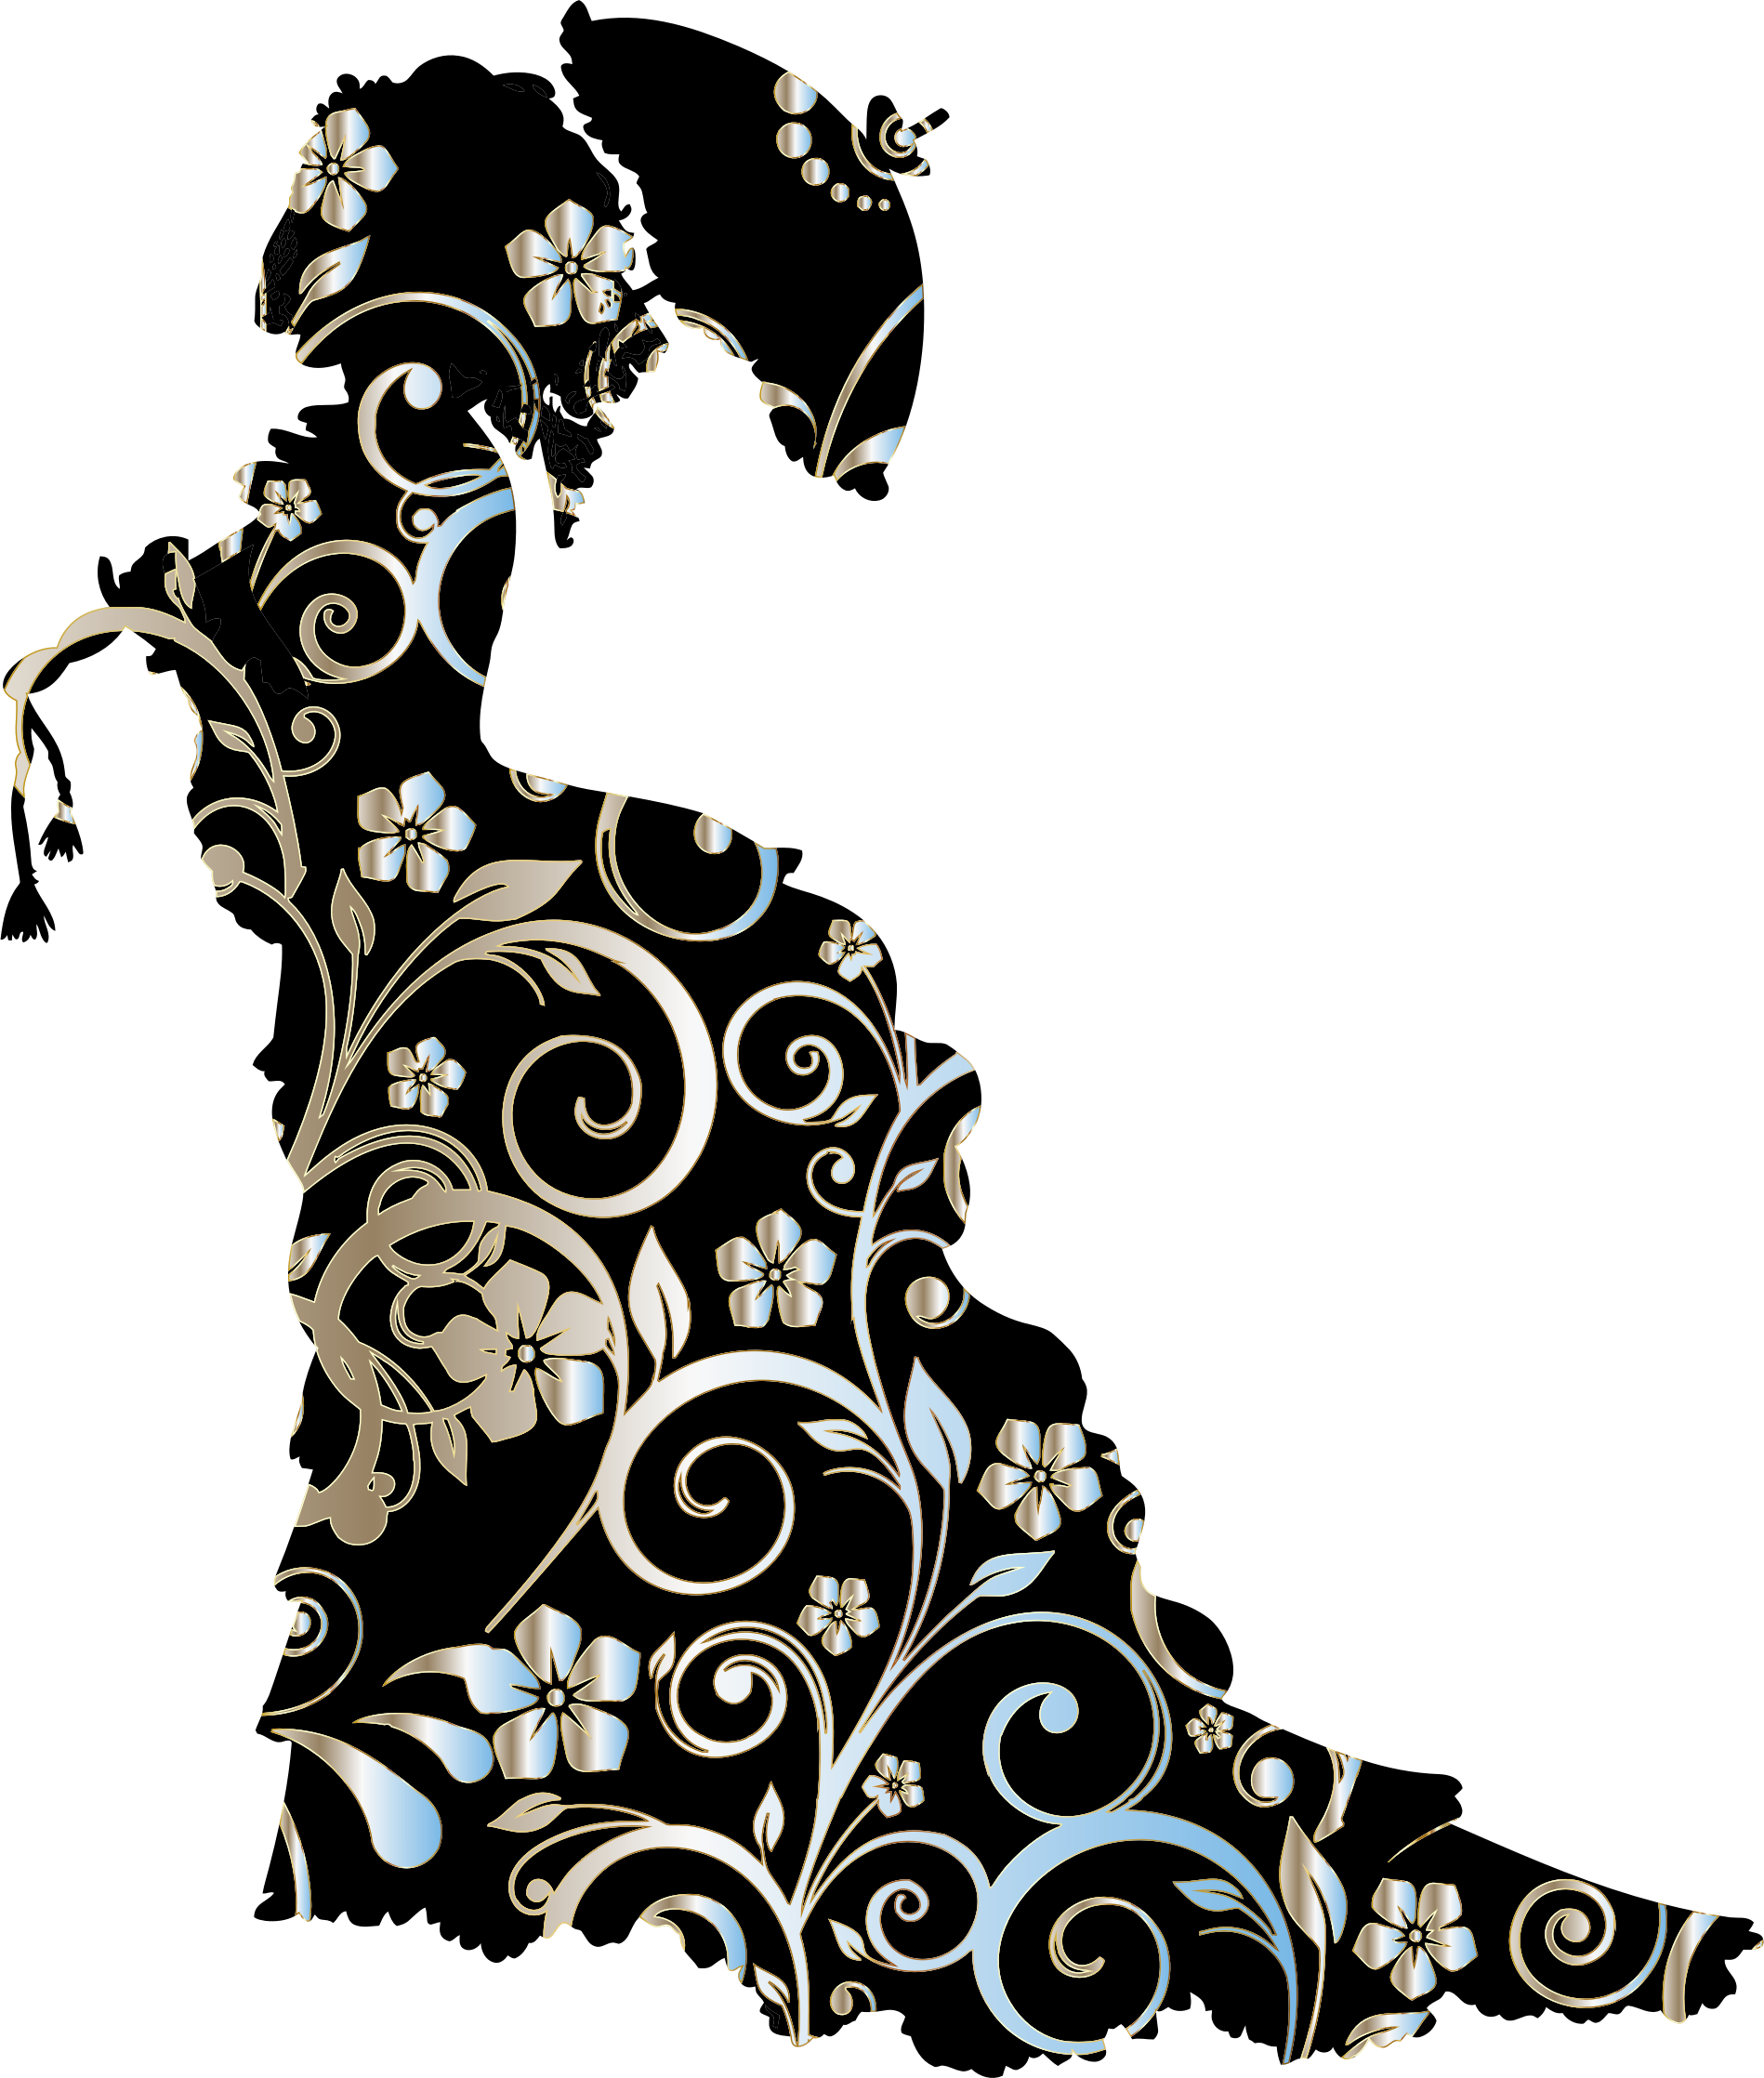 Vintige ladies silhouette clipart vector stock Silhouette Clip art - victorian png download - 1898*2236 ... vector stock